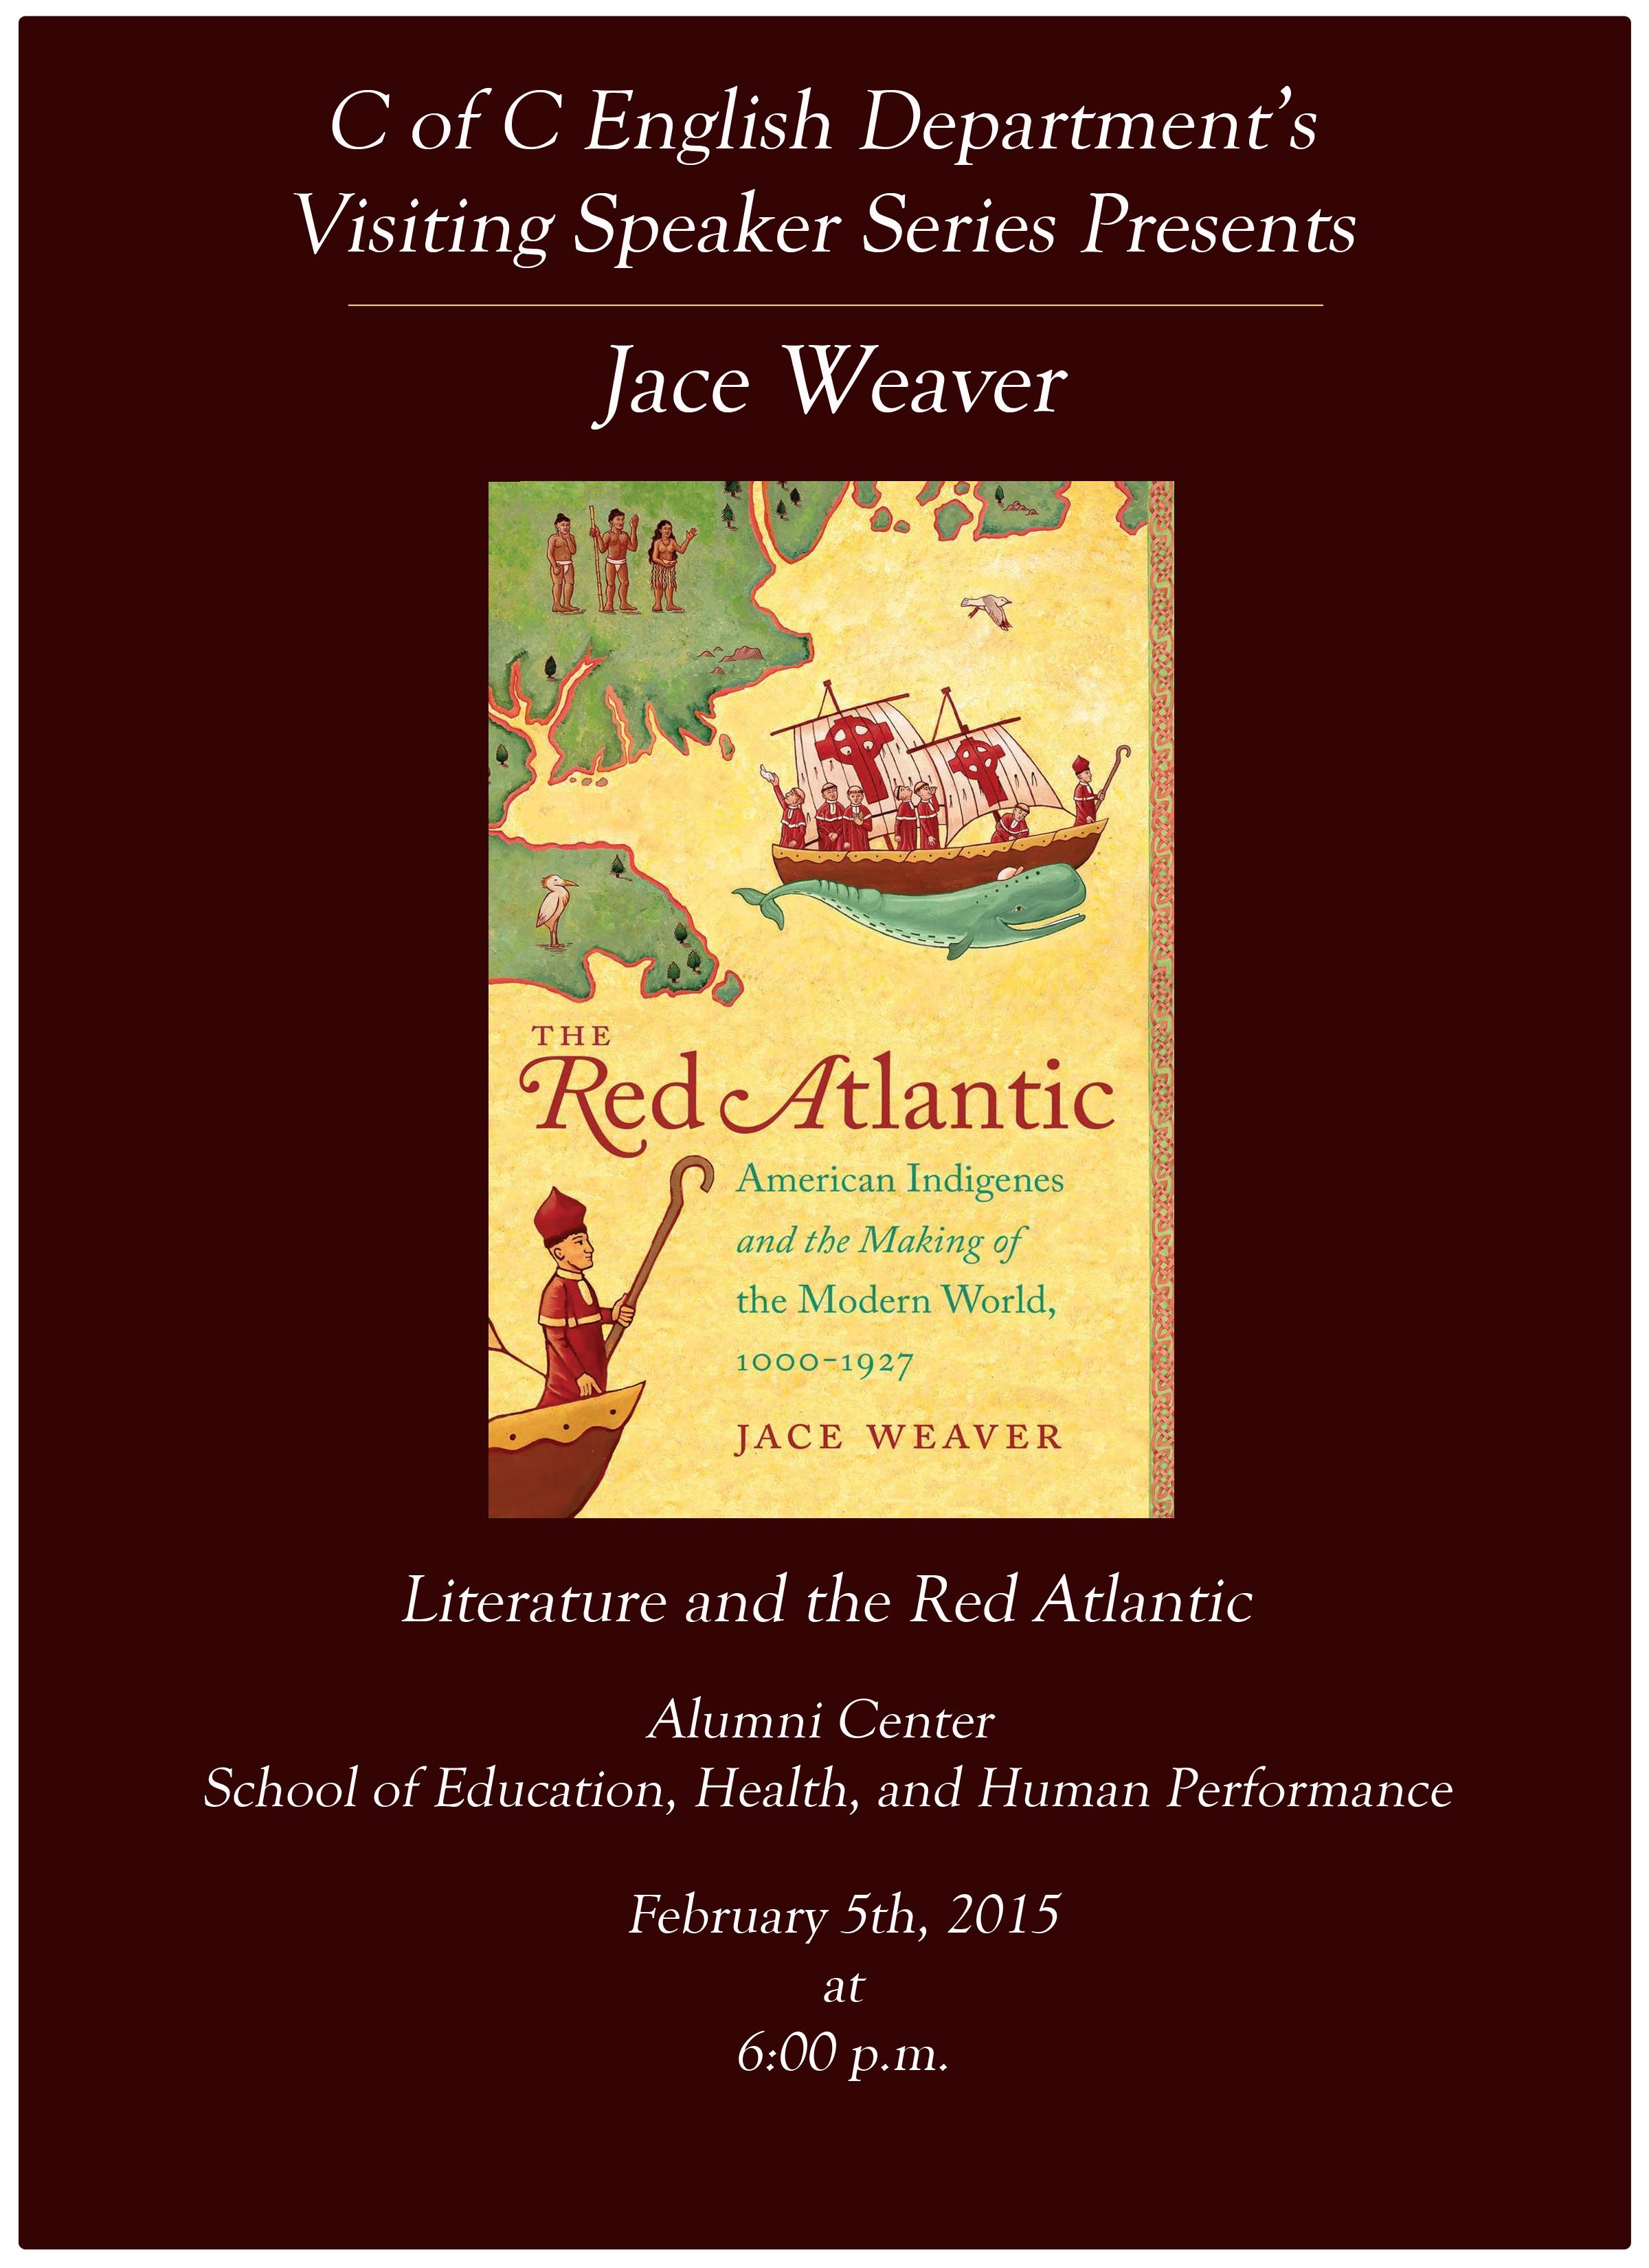 Jace Weaver Poster